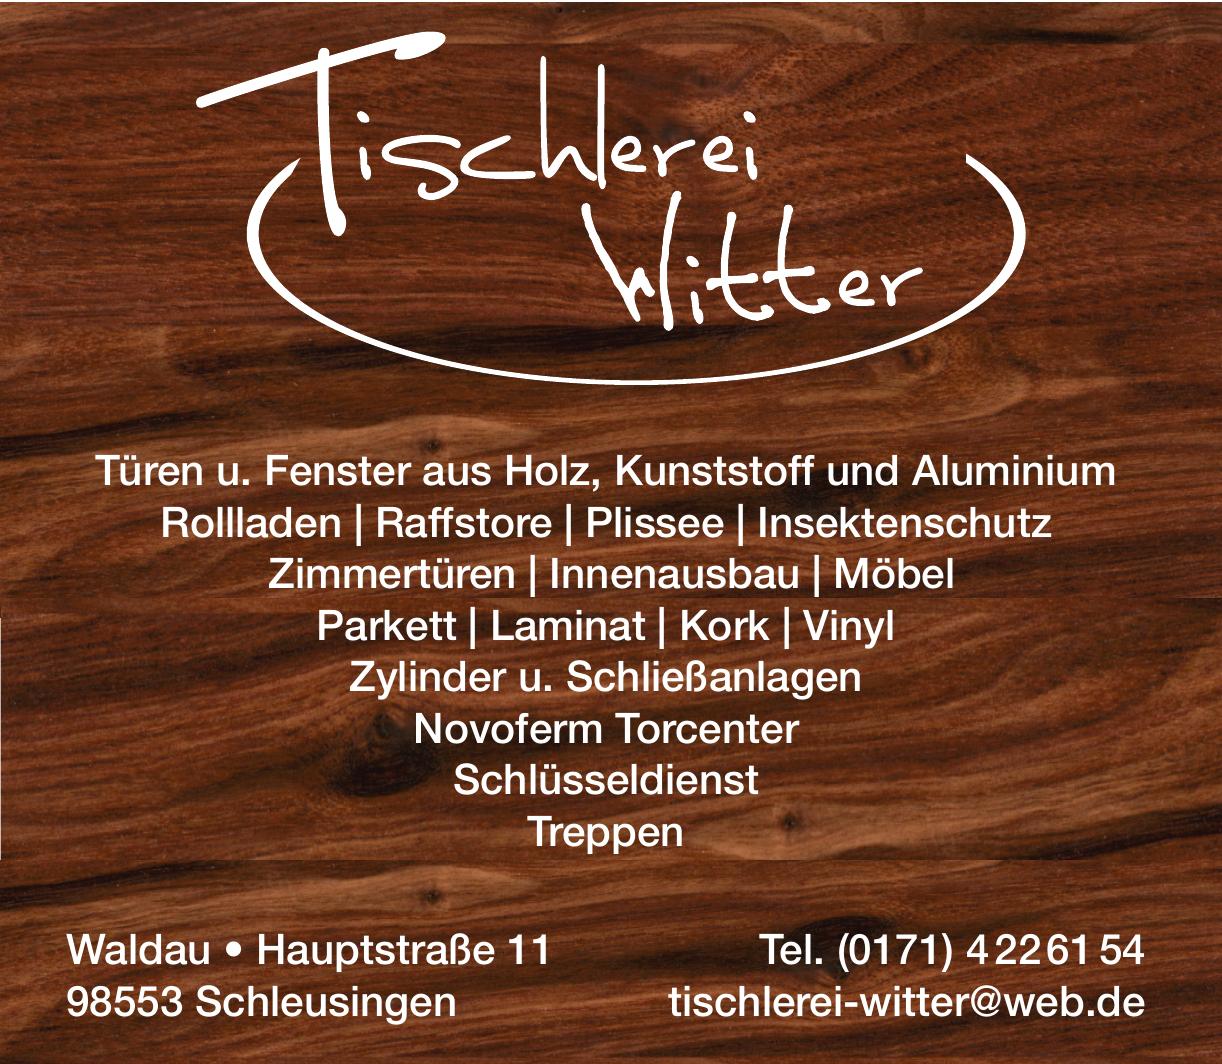 Tischlerei Witter